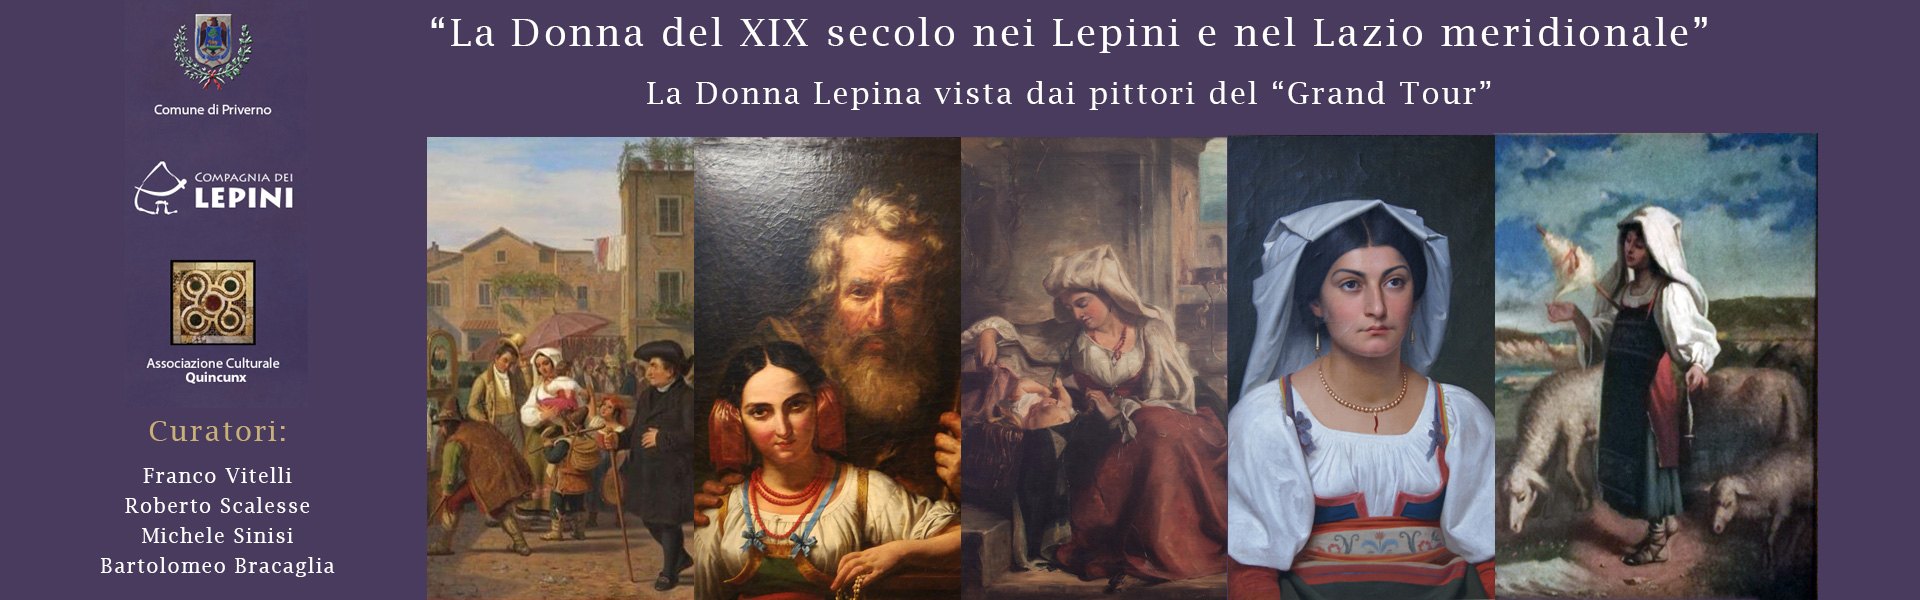 copertina-la-donna-lepina1920x600